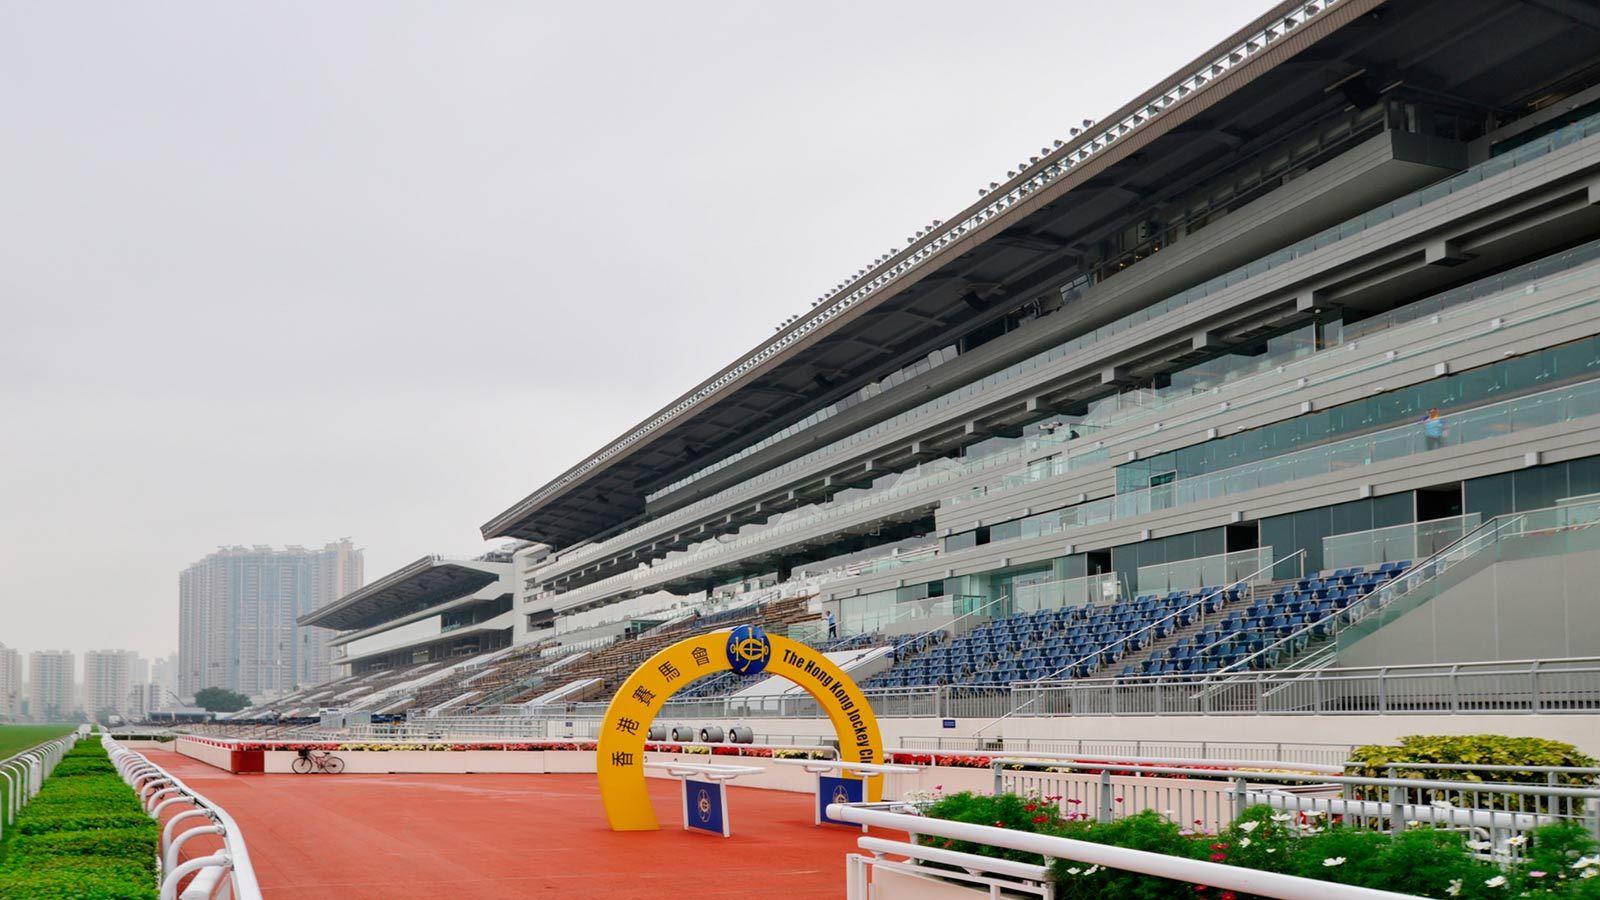 Sha Tin Racecource Fan Seating Area - Mace Group